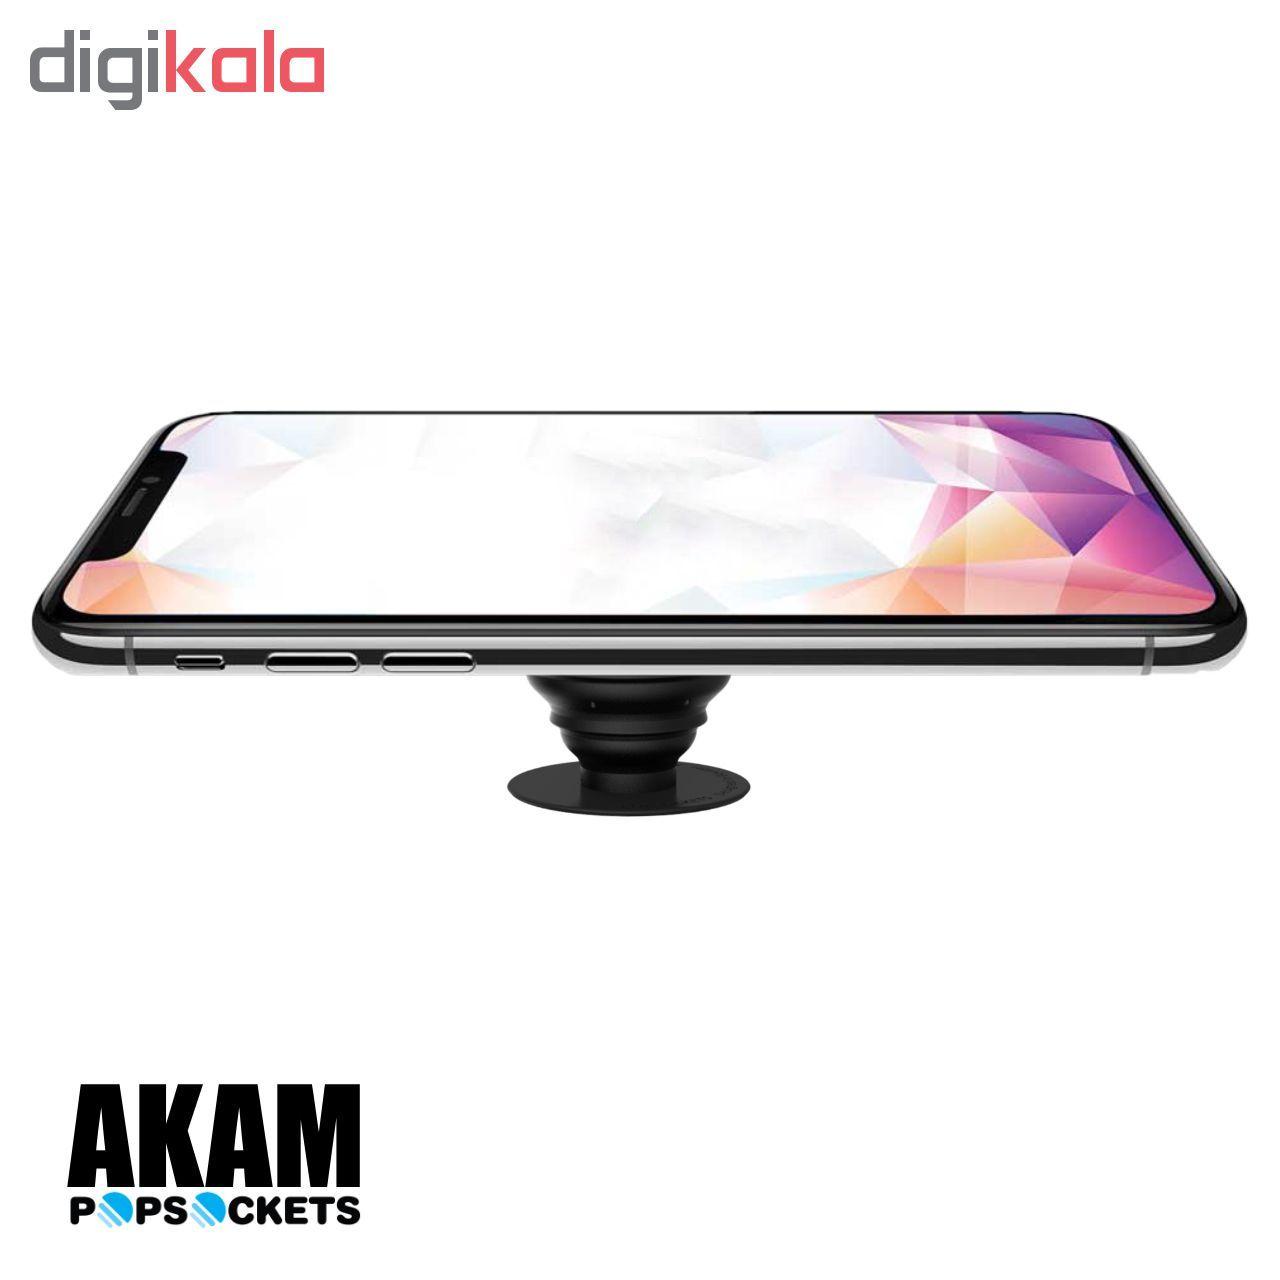 پایه نگهدارنده گوشی موبایل پاپ سوکت آکام مدل APS0058 main 1 10